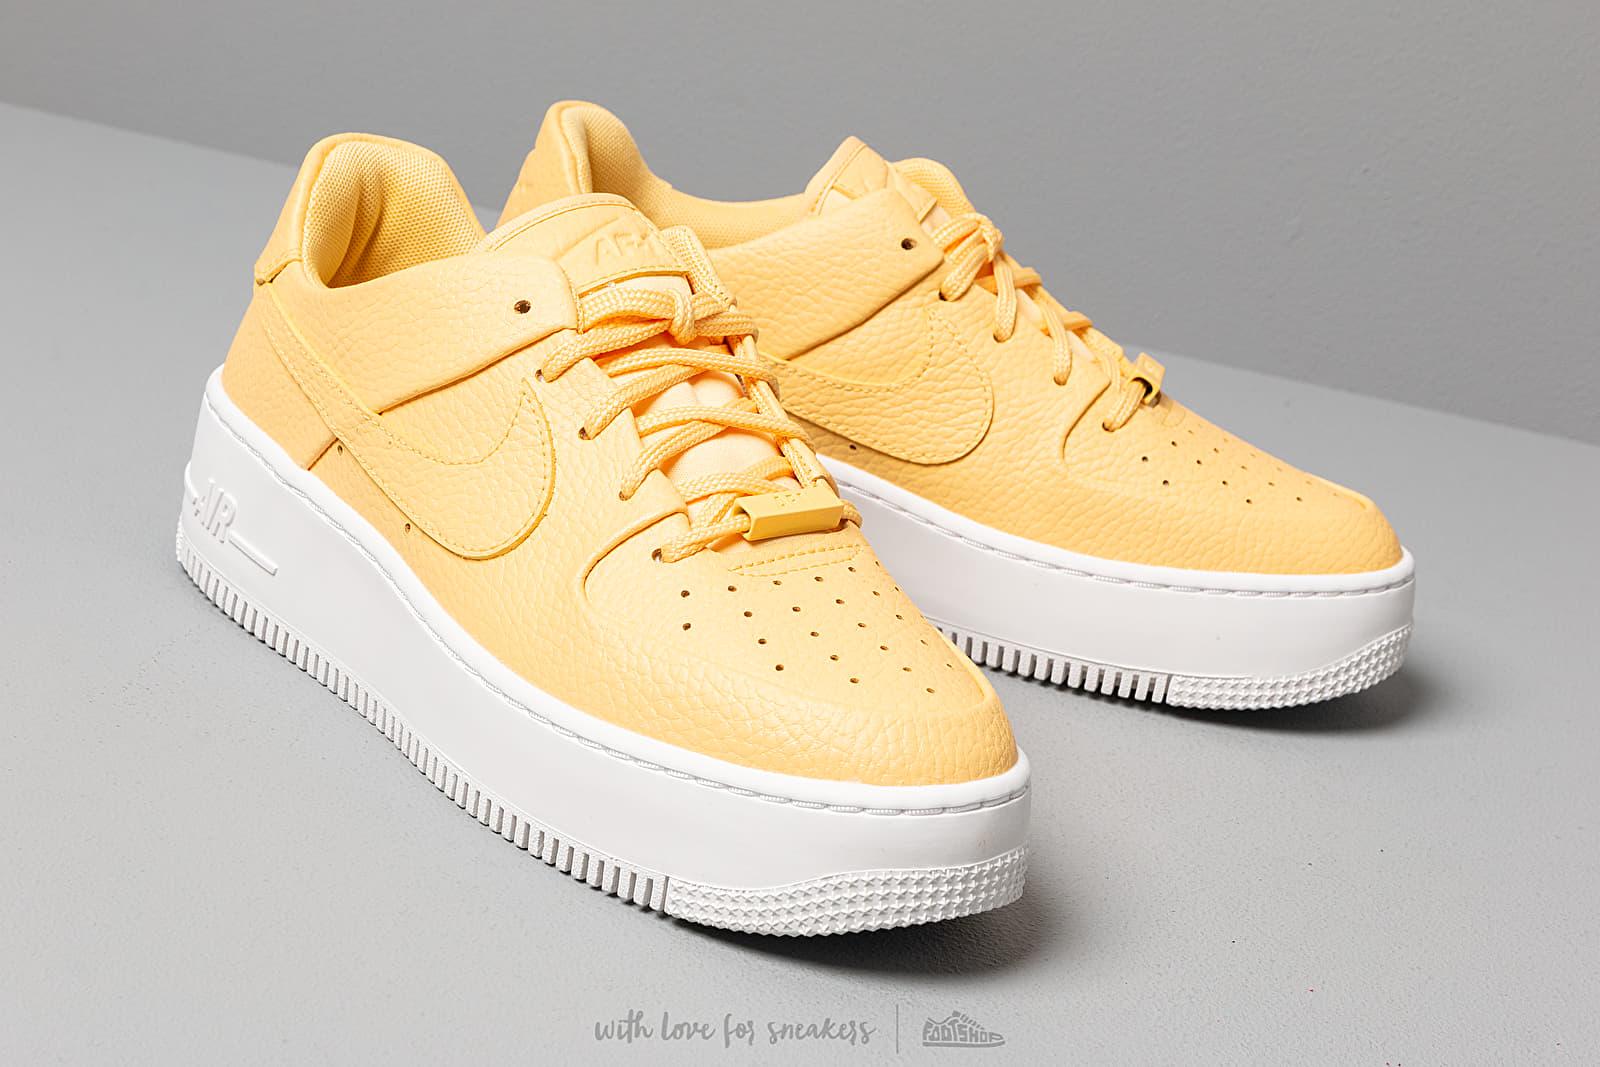 Buty Damskie Nike WMNS Air Force 1 Sage Low Topaz Gold